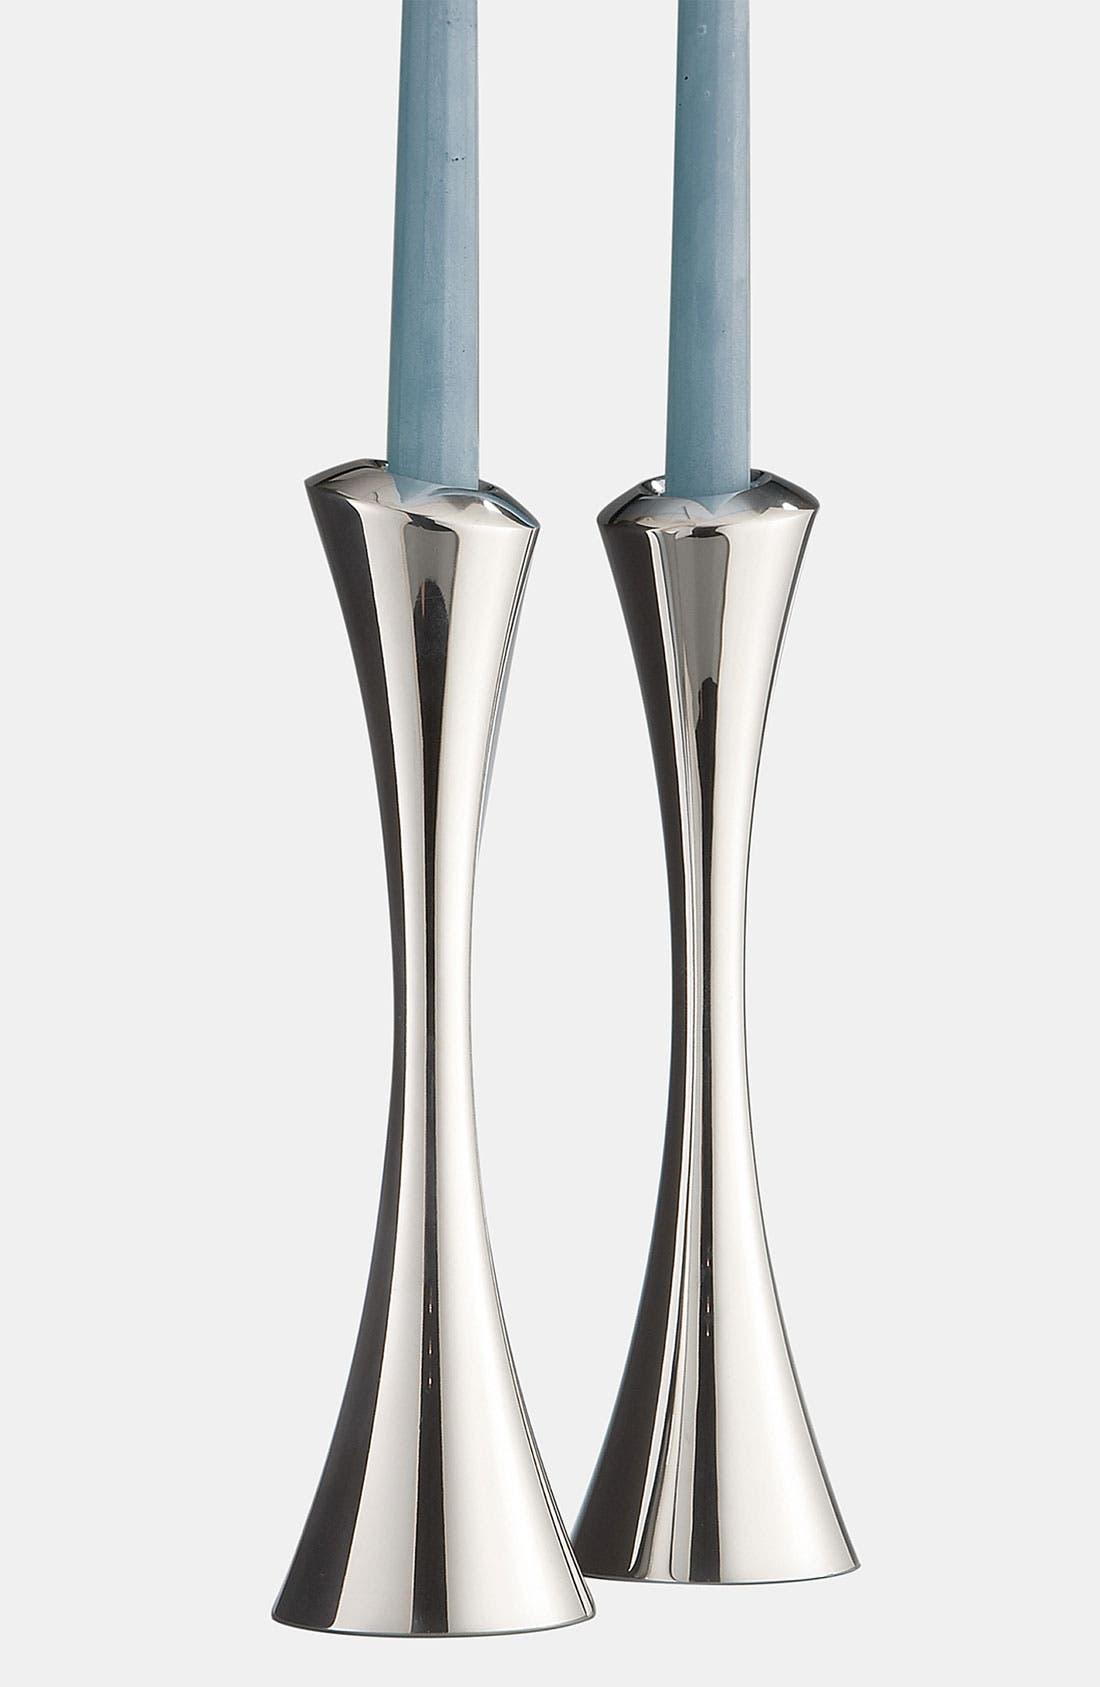 Nambé Aquila Set of 2 Candlesticks